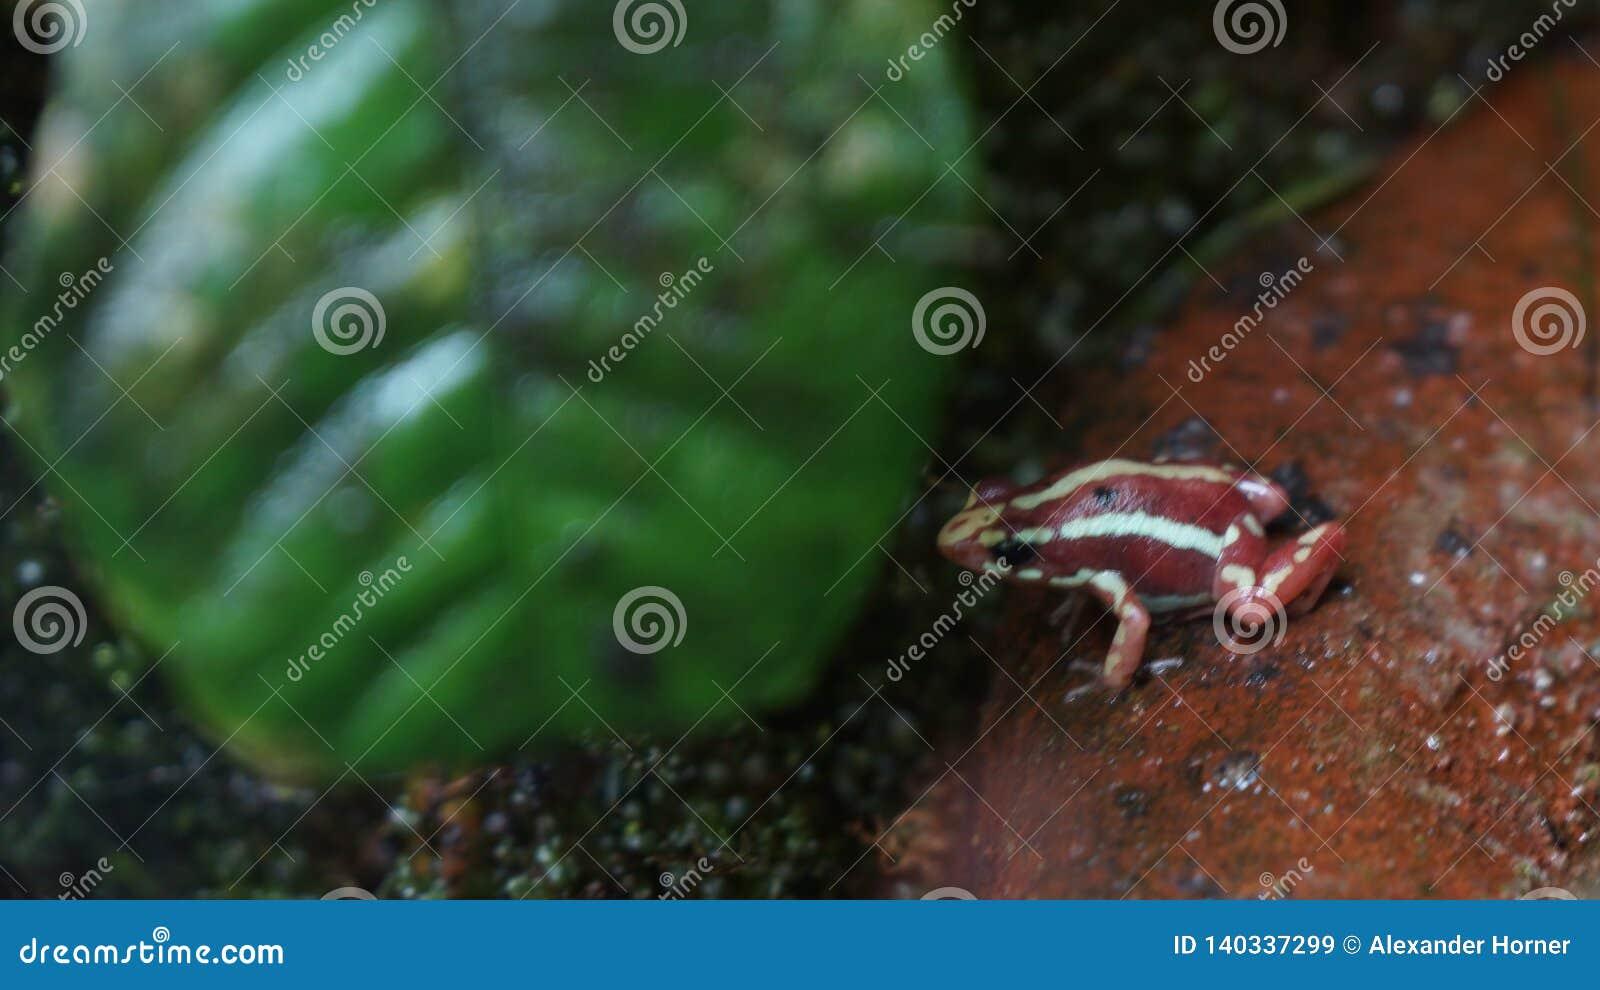 Little poison dart frog in front of leaf